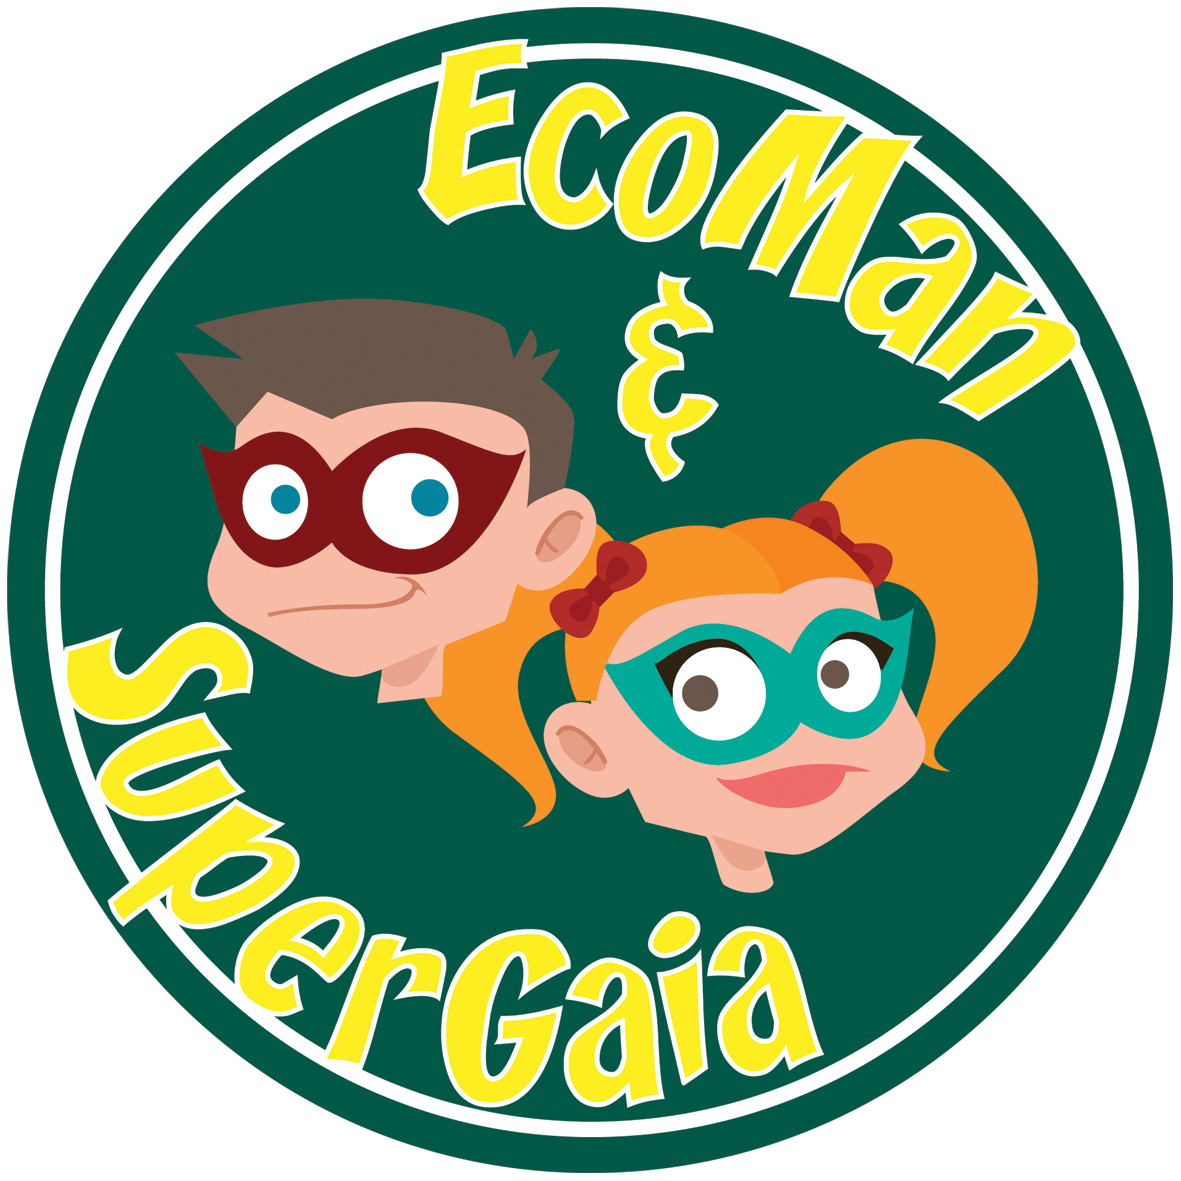 Ecoman & Supergaia